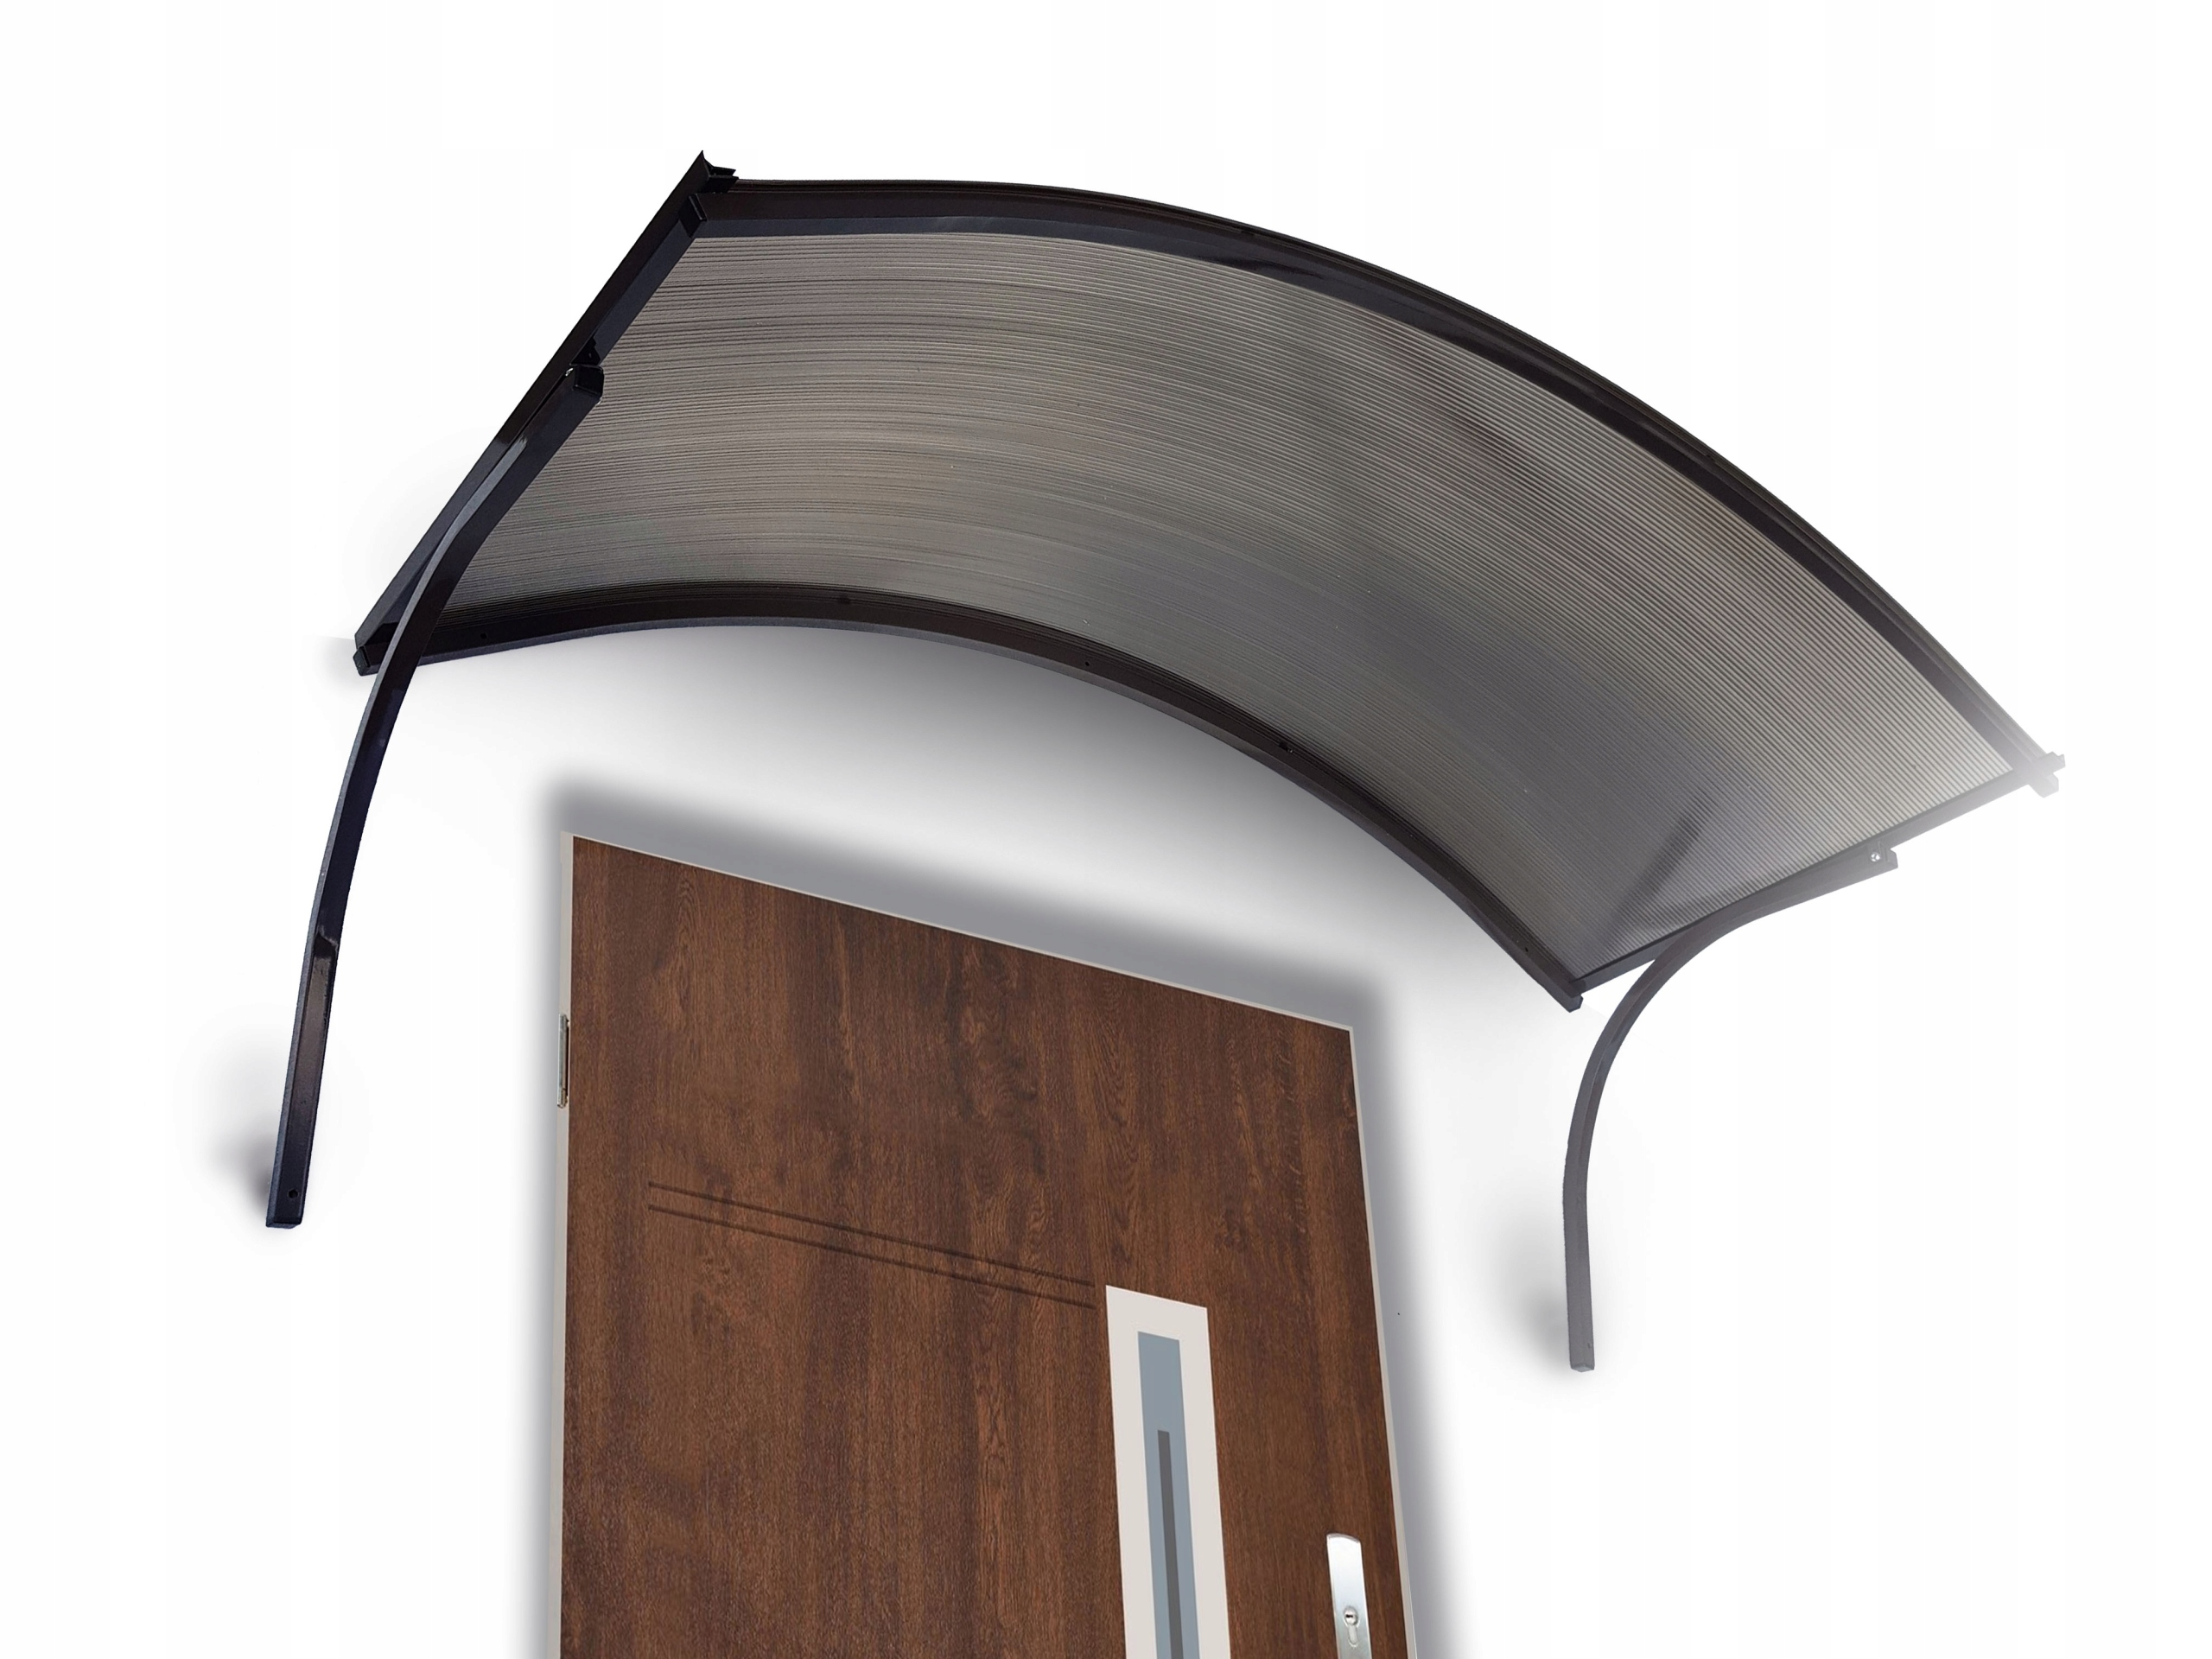 Baldachýn nad dvere, strecha 170x25x70 s podperami